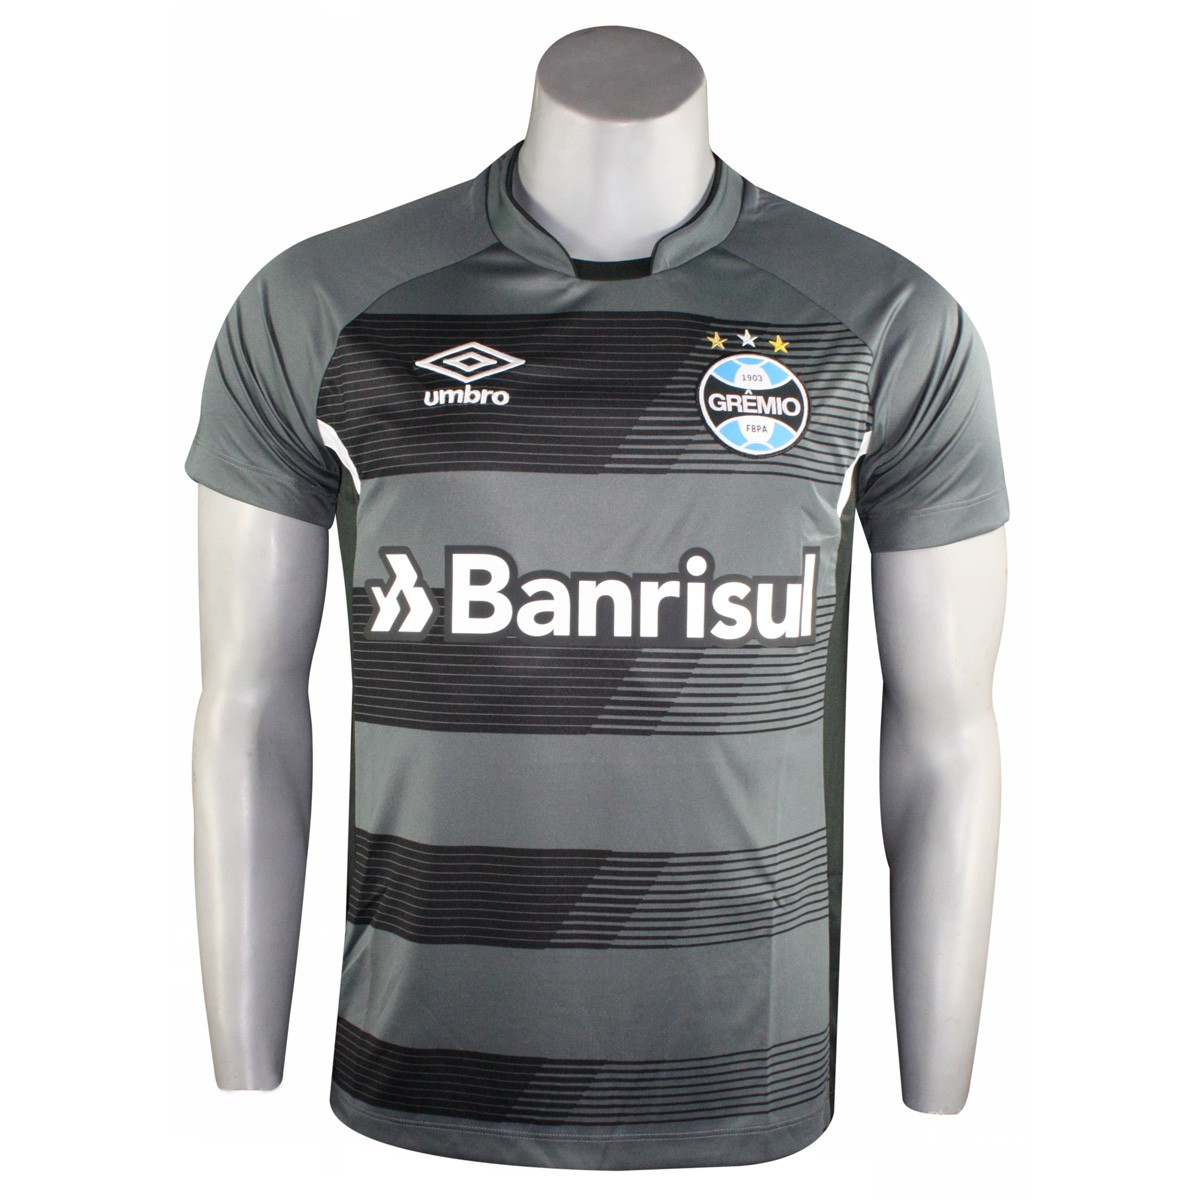 4fbebabc6ca63 Camisa Masculina Umbro Grêmio Treino 2017 3G160085.812 Grafite Preto Branco